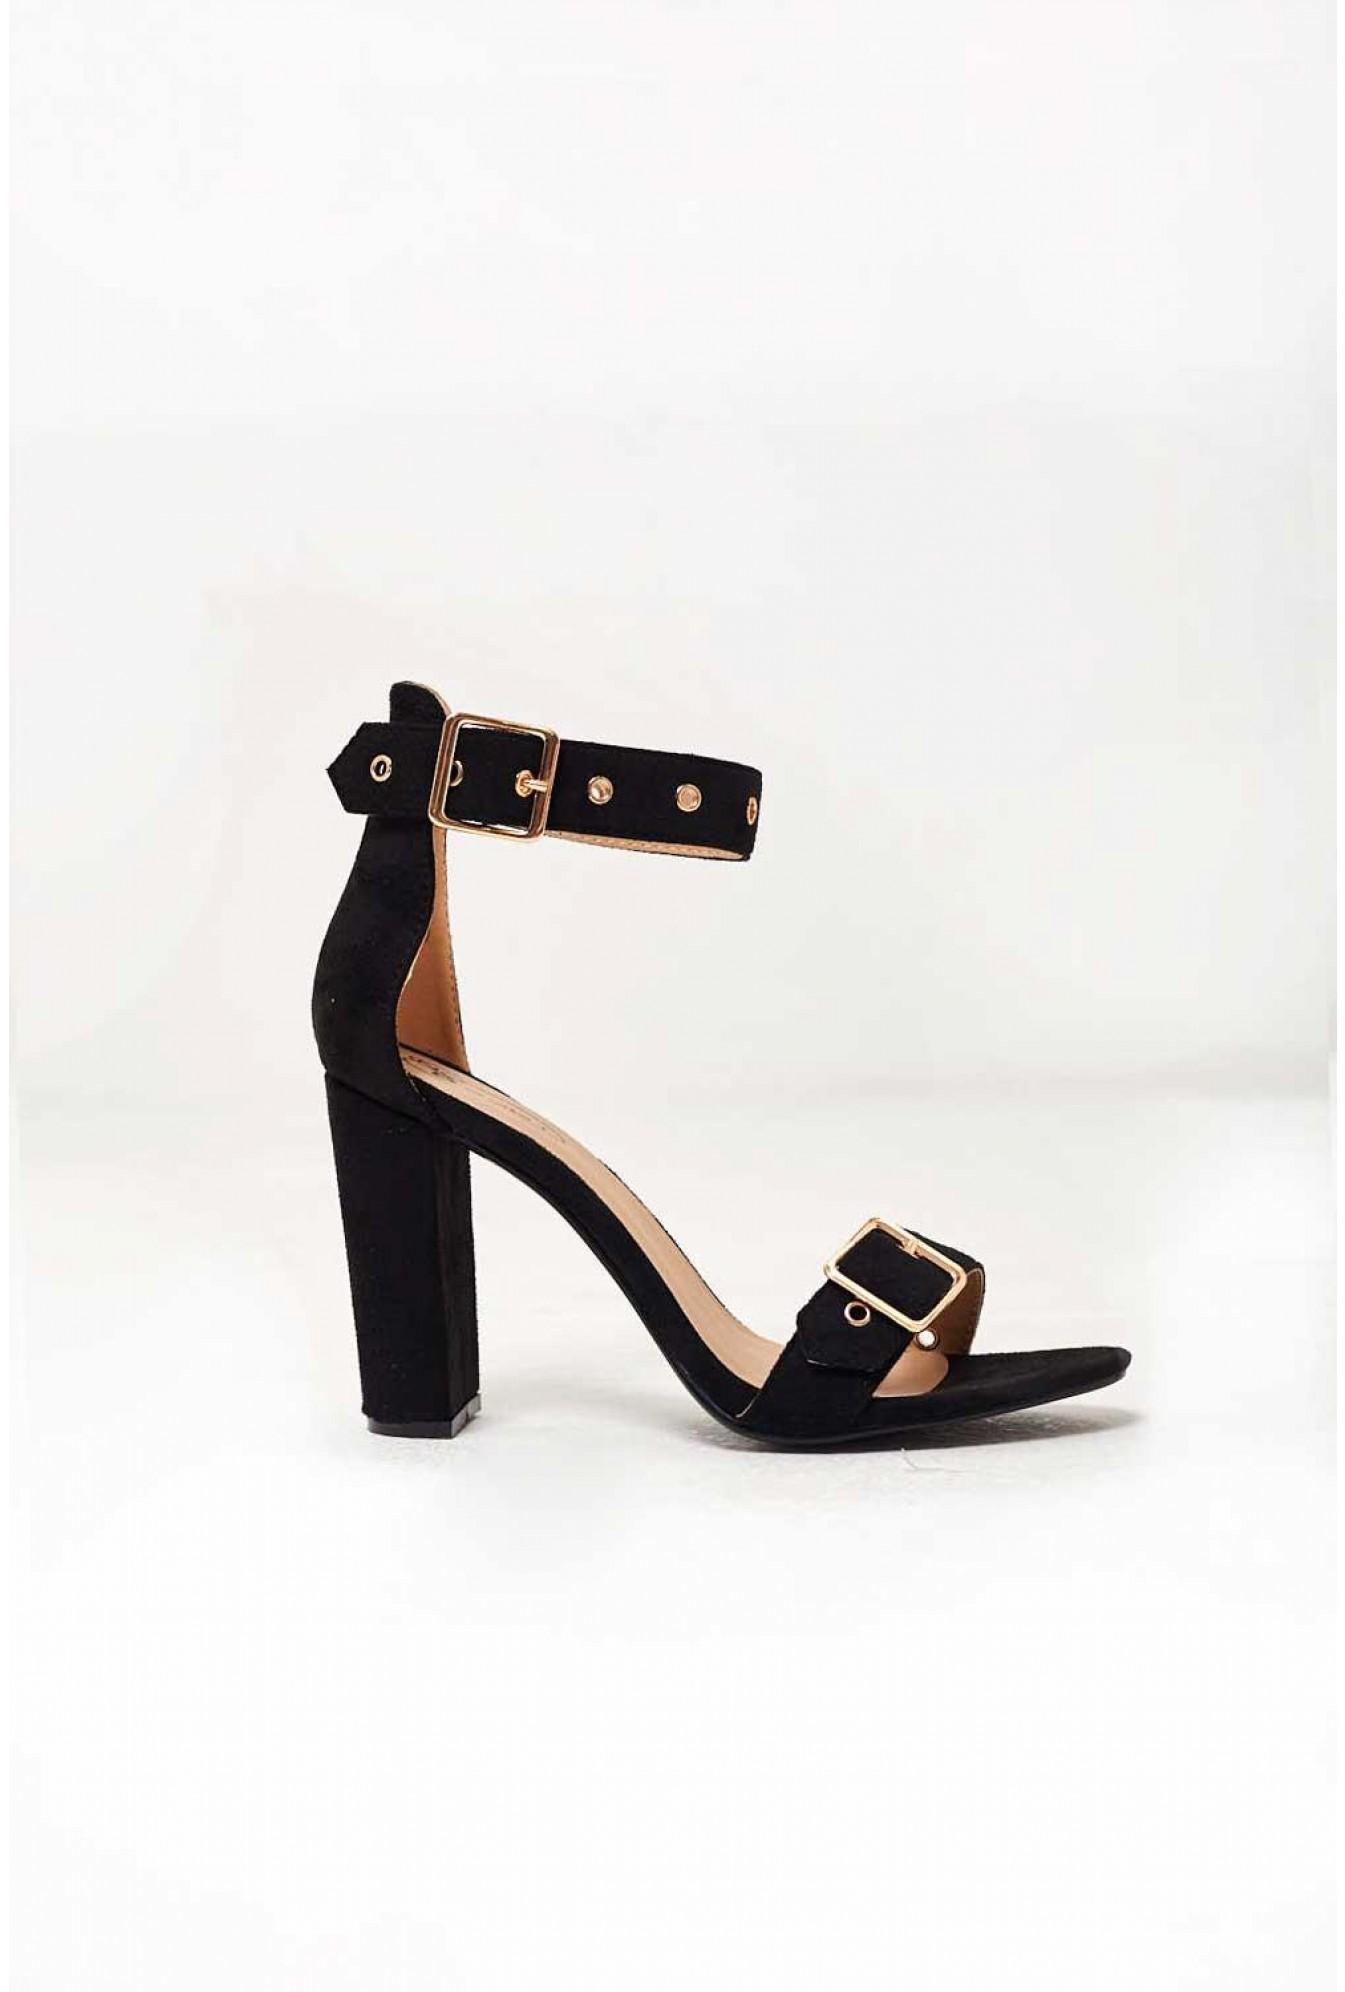 detailed images 2018 shoes no sale tax Jace Block Heel Sandals in Black